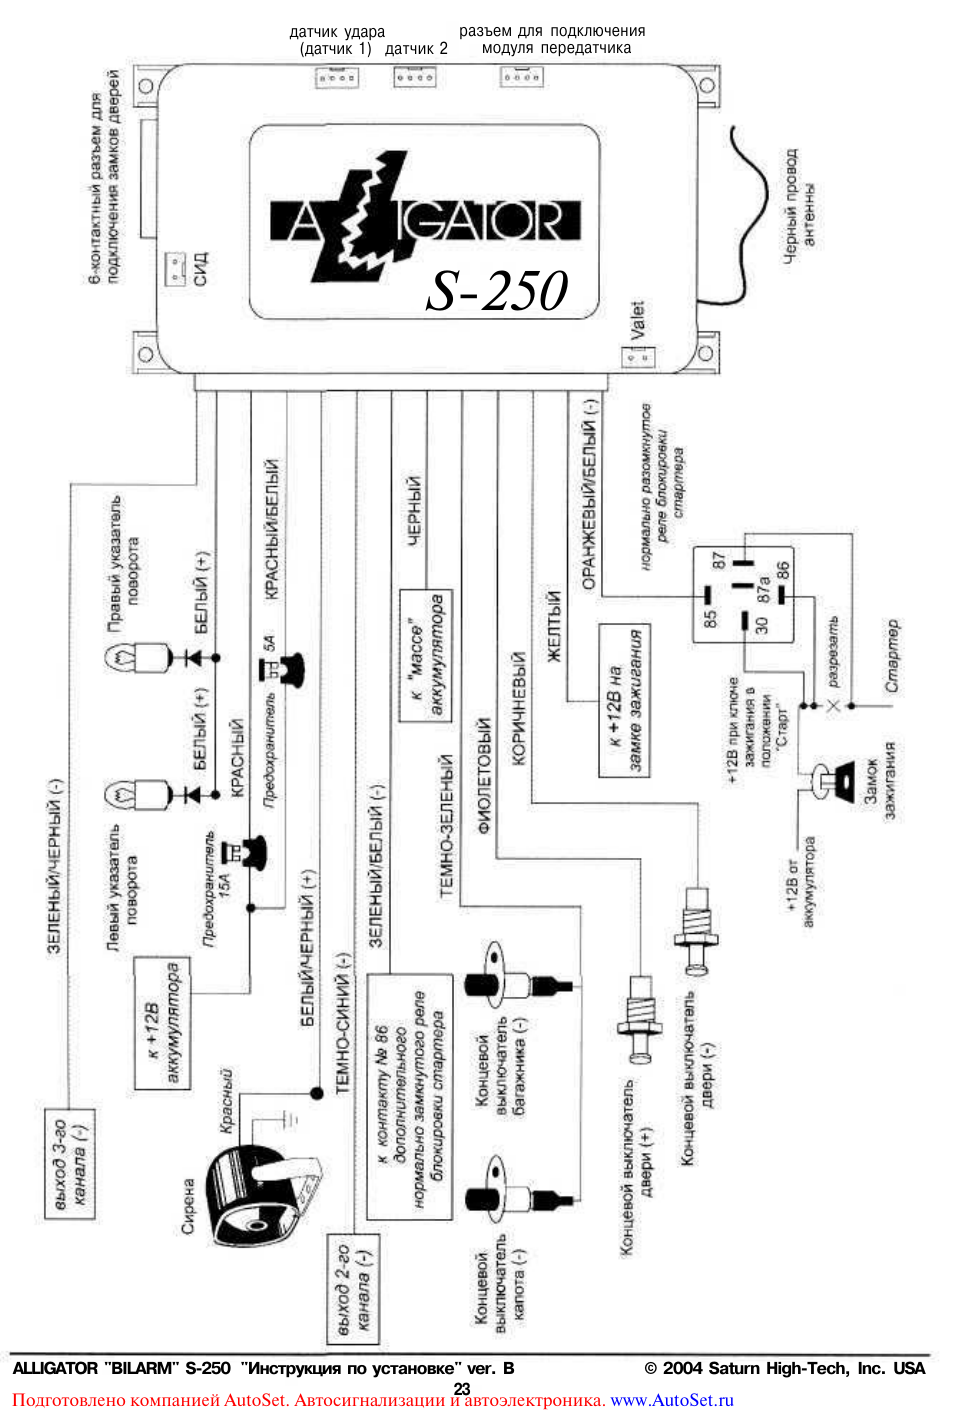 Схема на автосигнализацию аллигатор